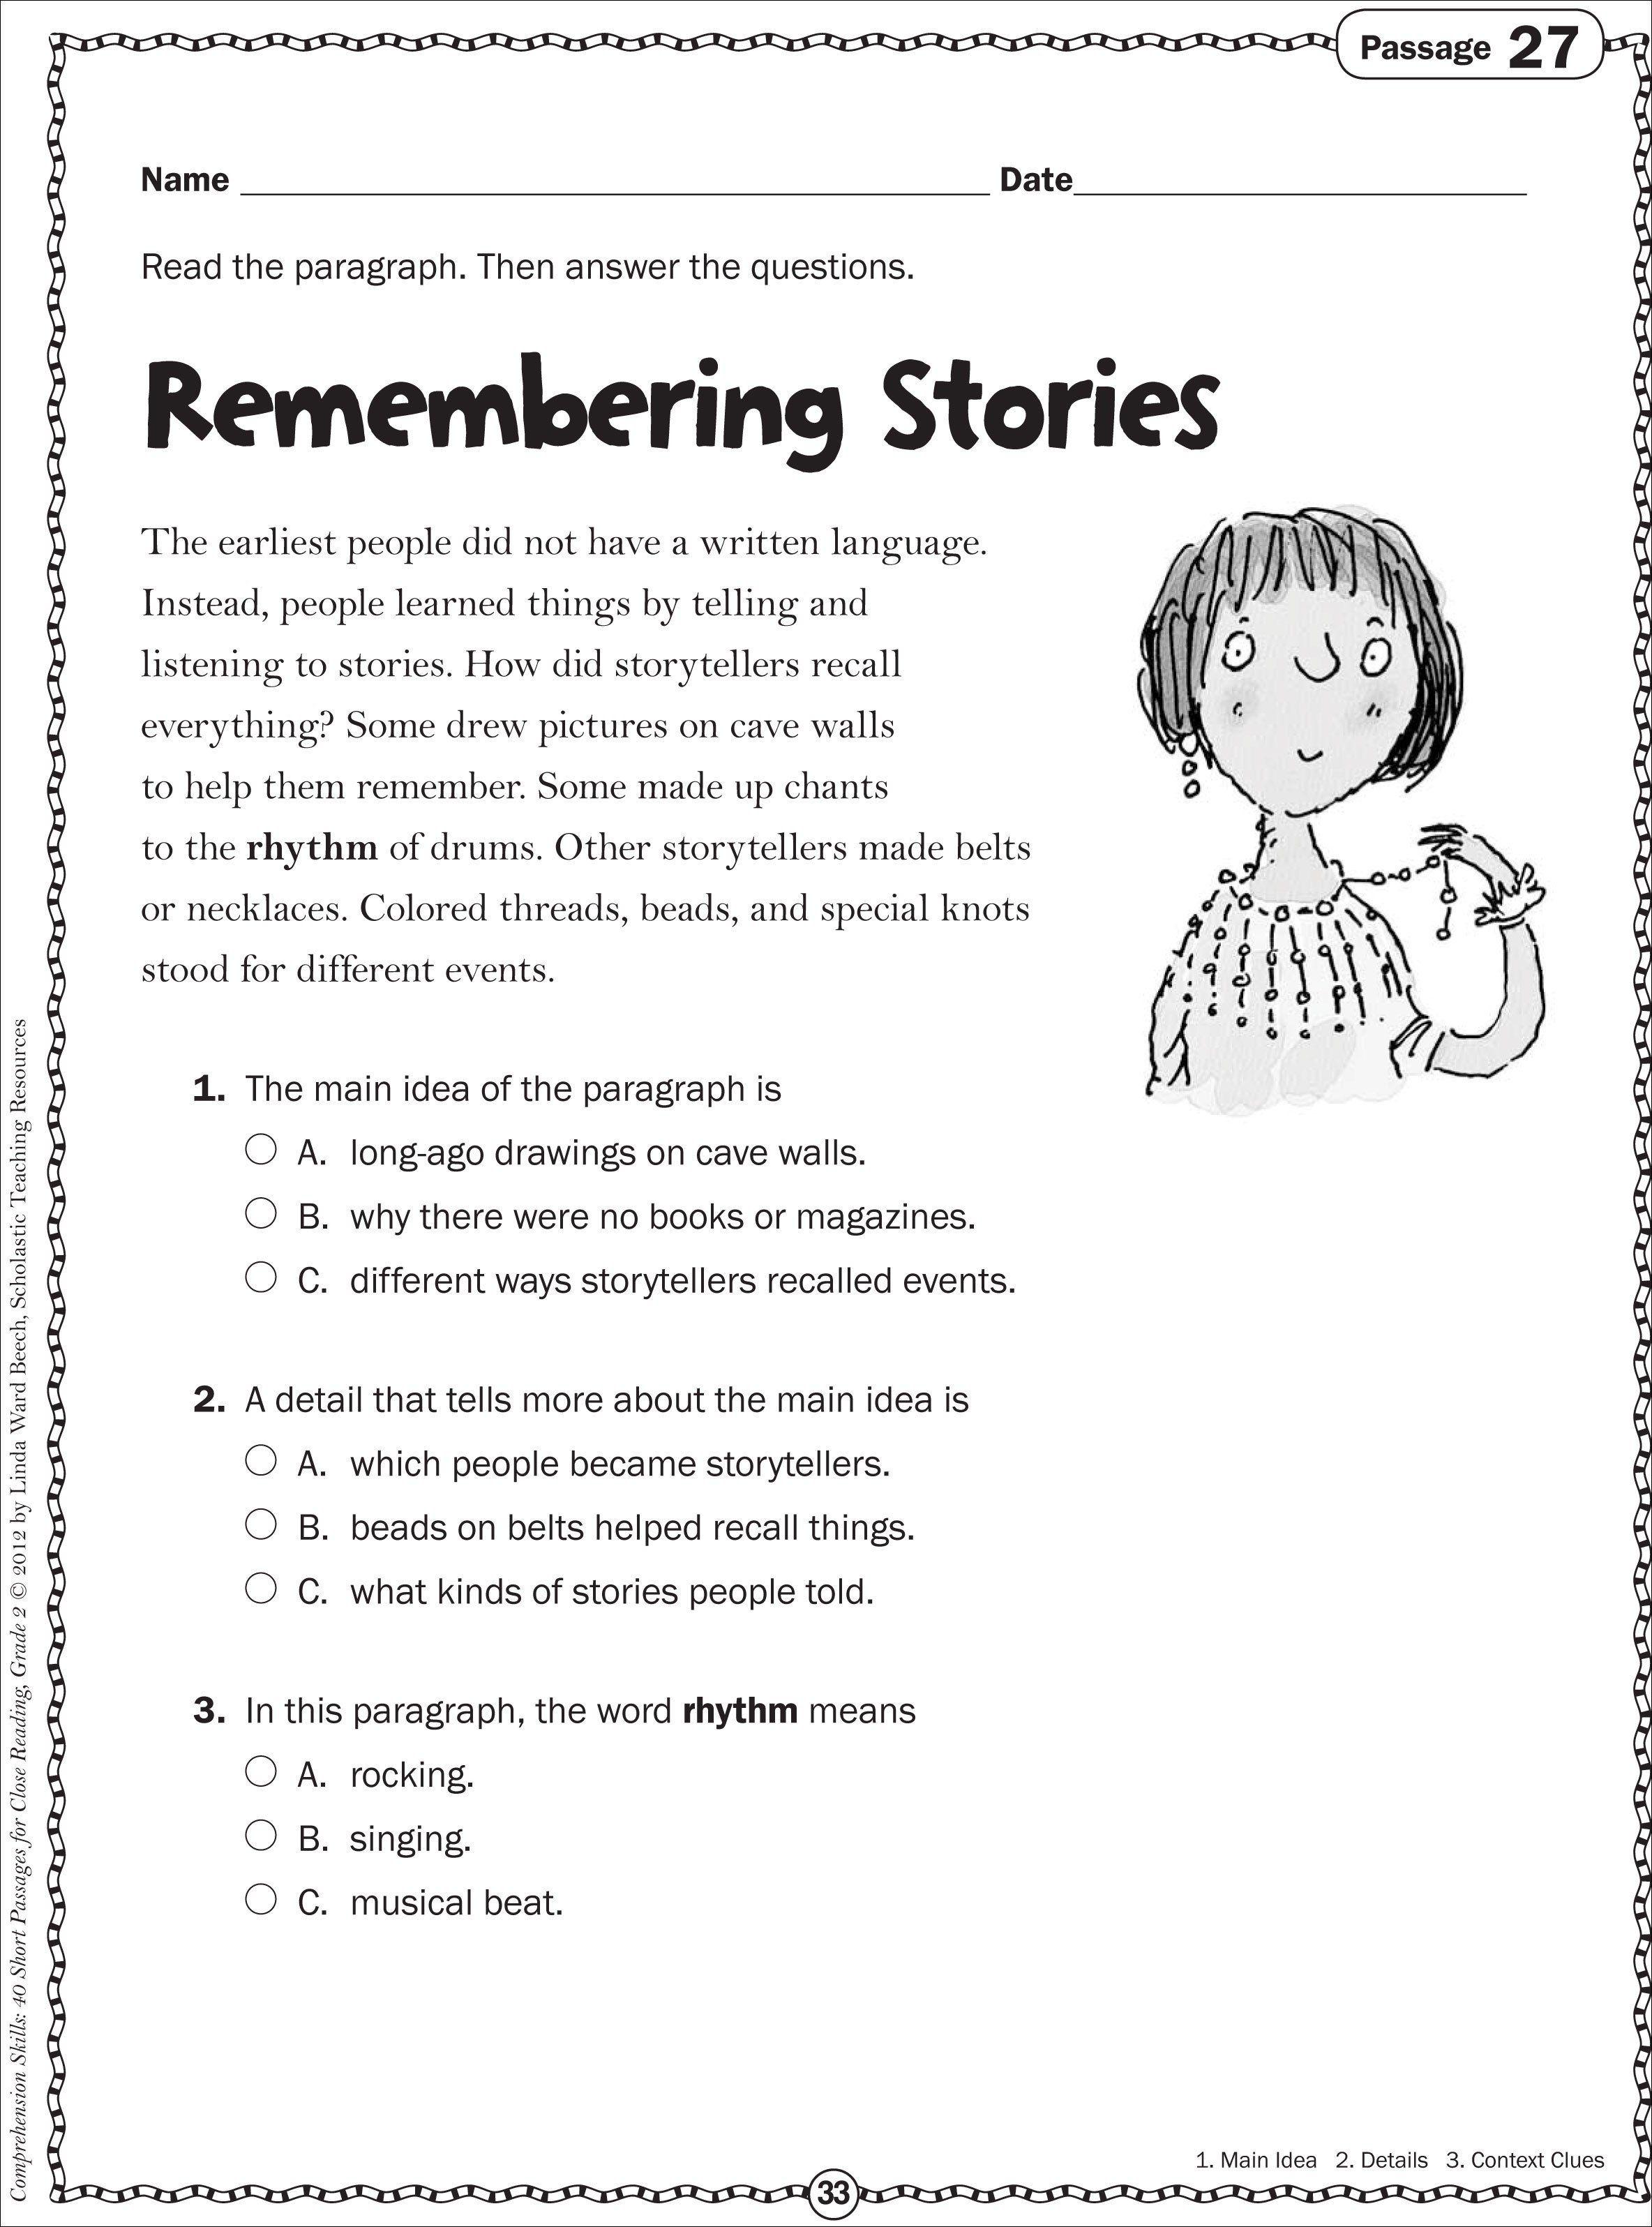 10 Attractive Main Idea And Details Worksheets 3rd Grade Comprehension Worksheets Main Reading Worksheets Main Idea Worksheet Reading Comprehension Worksheets